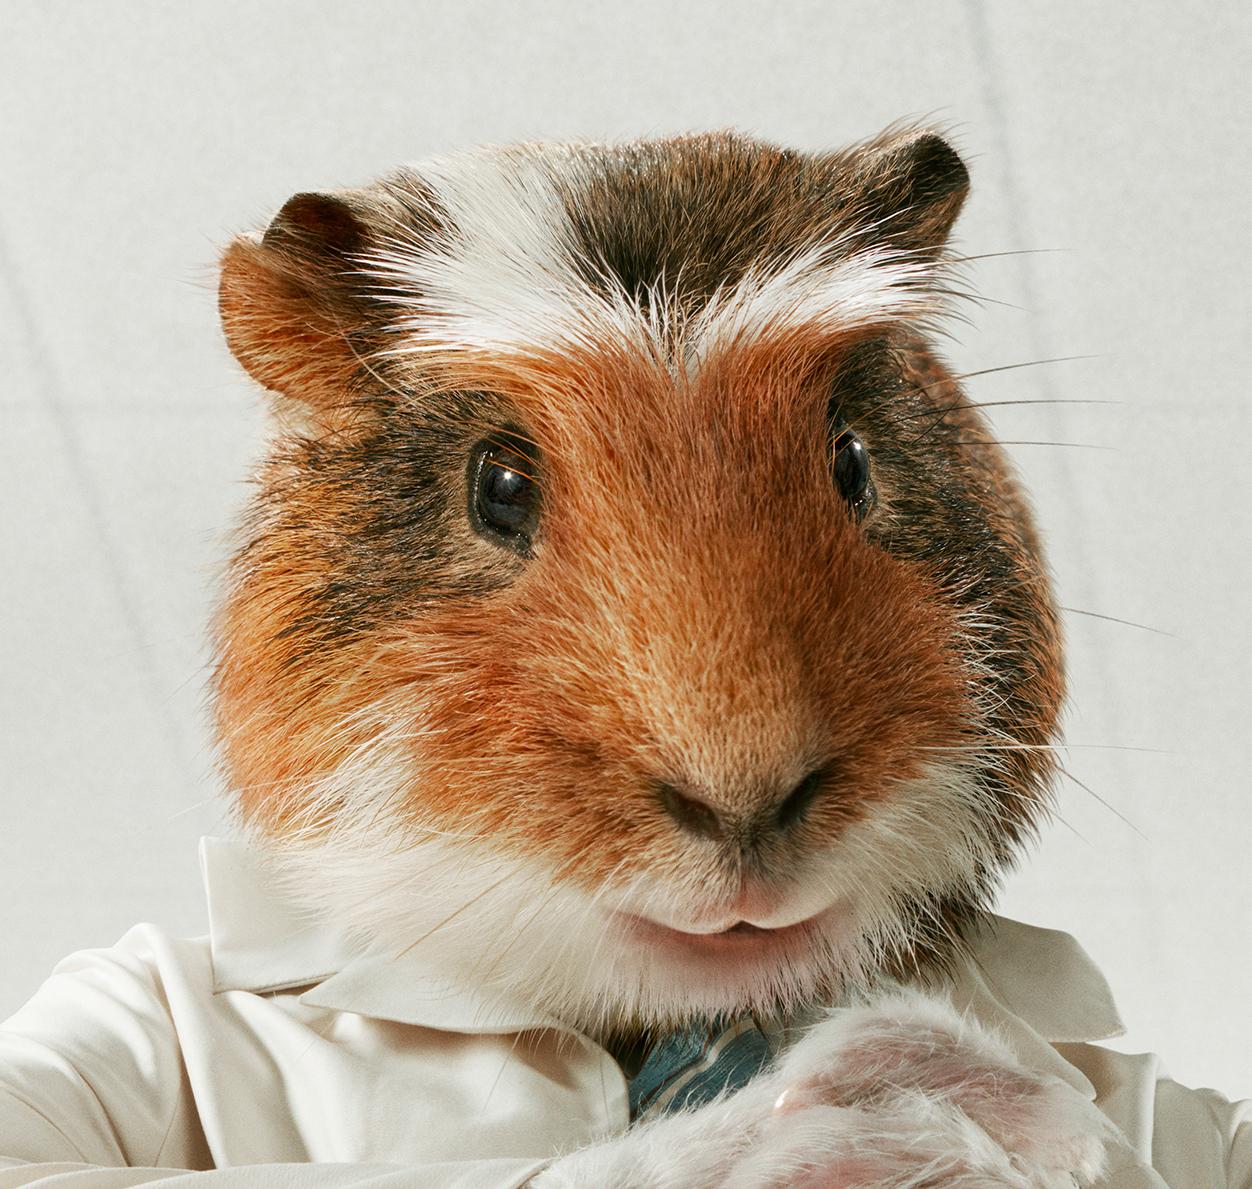 Морские свинки для рекламной кампании Energia / работа Chris Roome и  Happy Finish